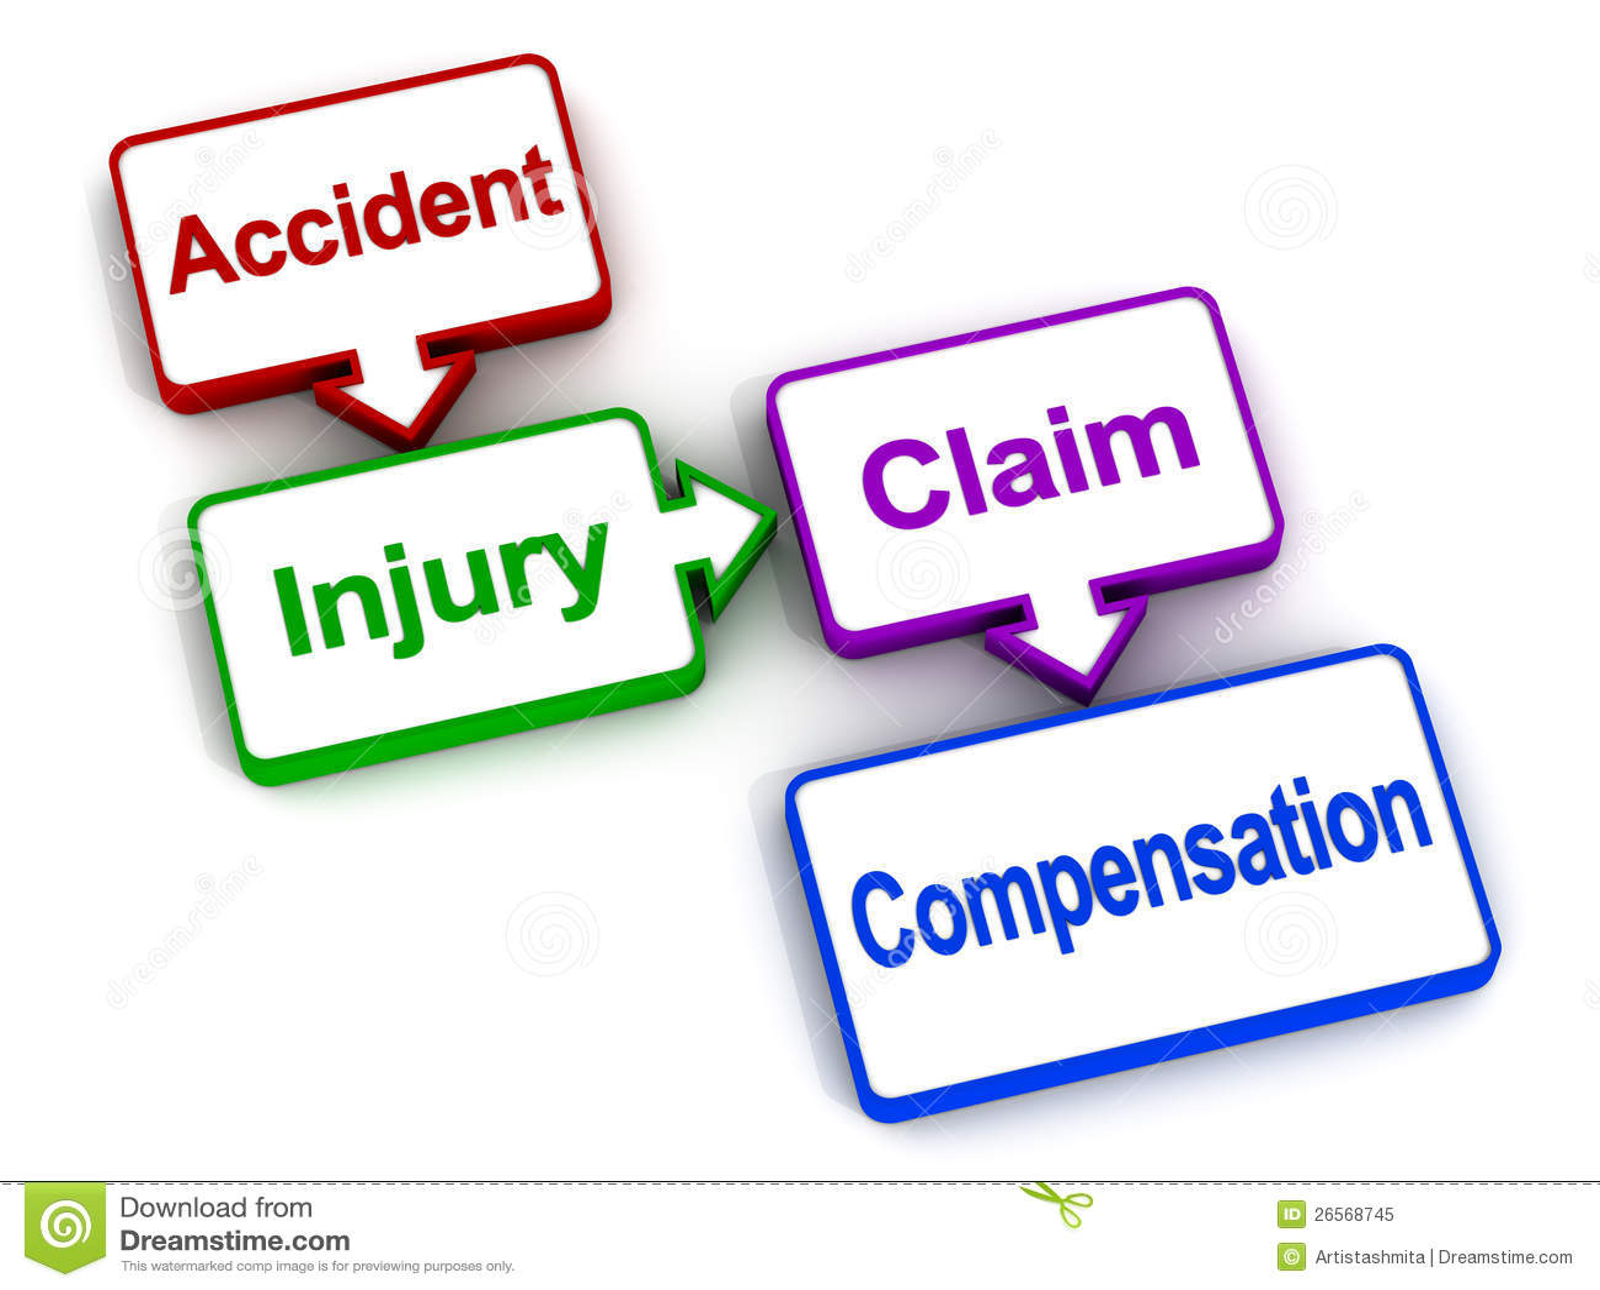 Utah Manganese Injury Claim